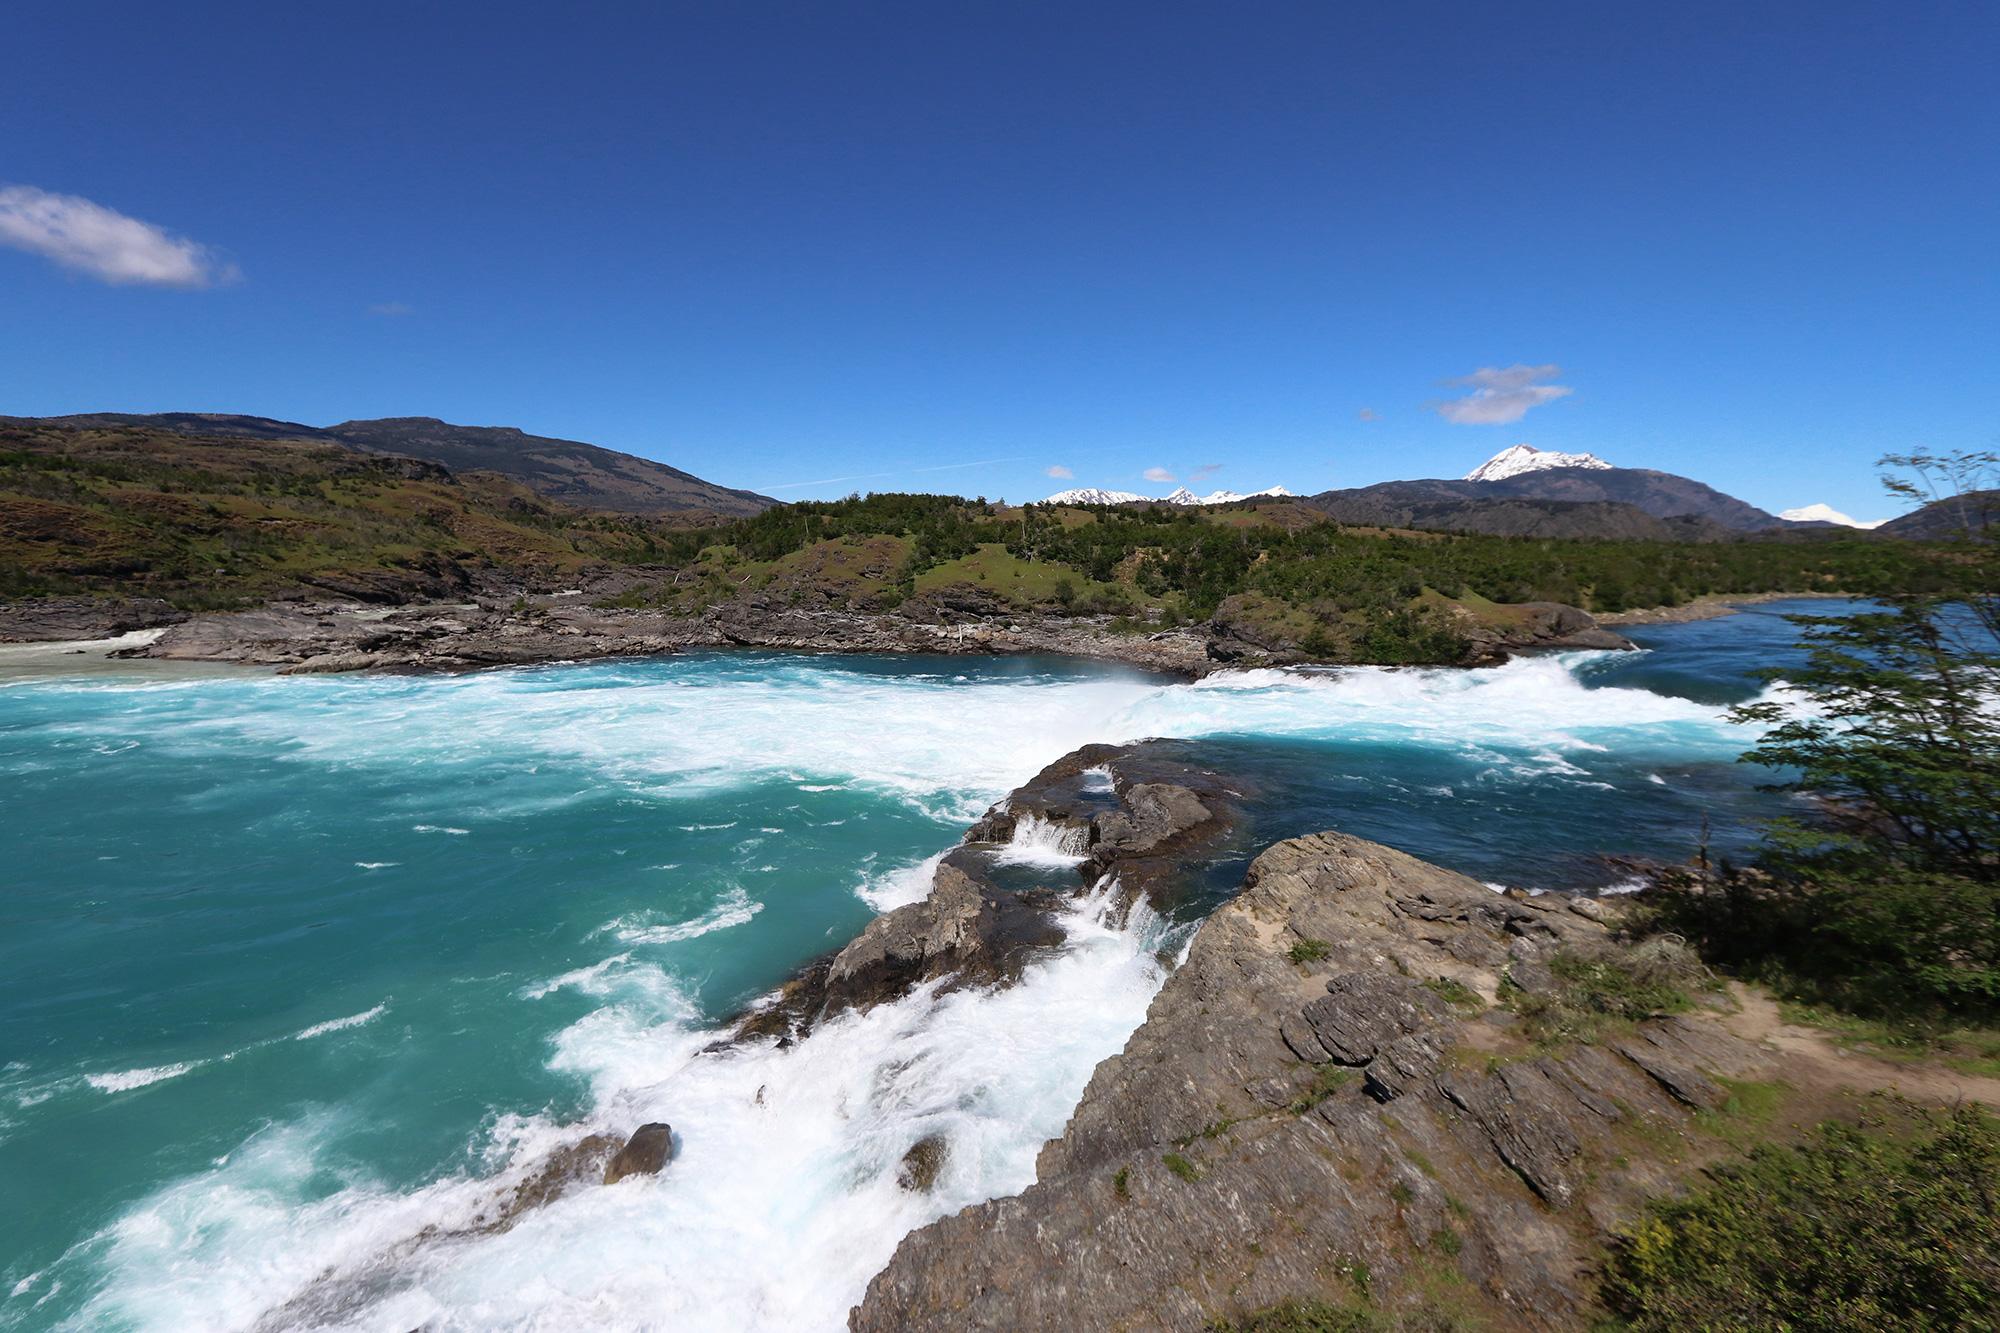 Reisverslag Patagonië - Confluence Rio Baker en Rio Neff